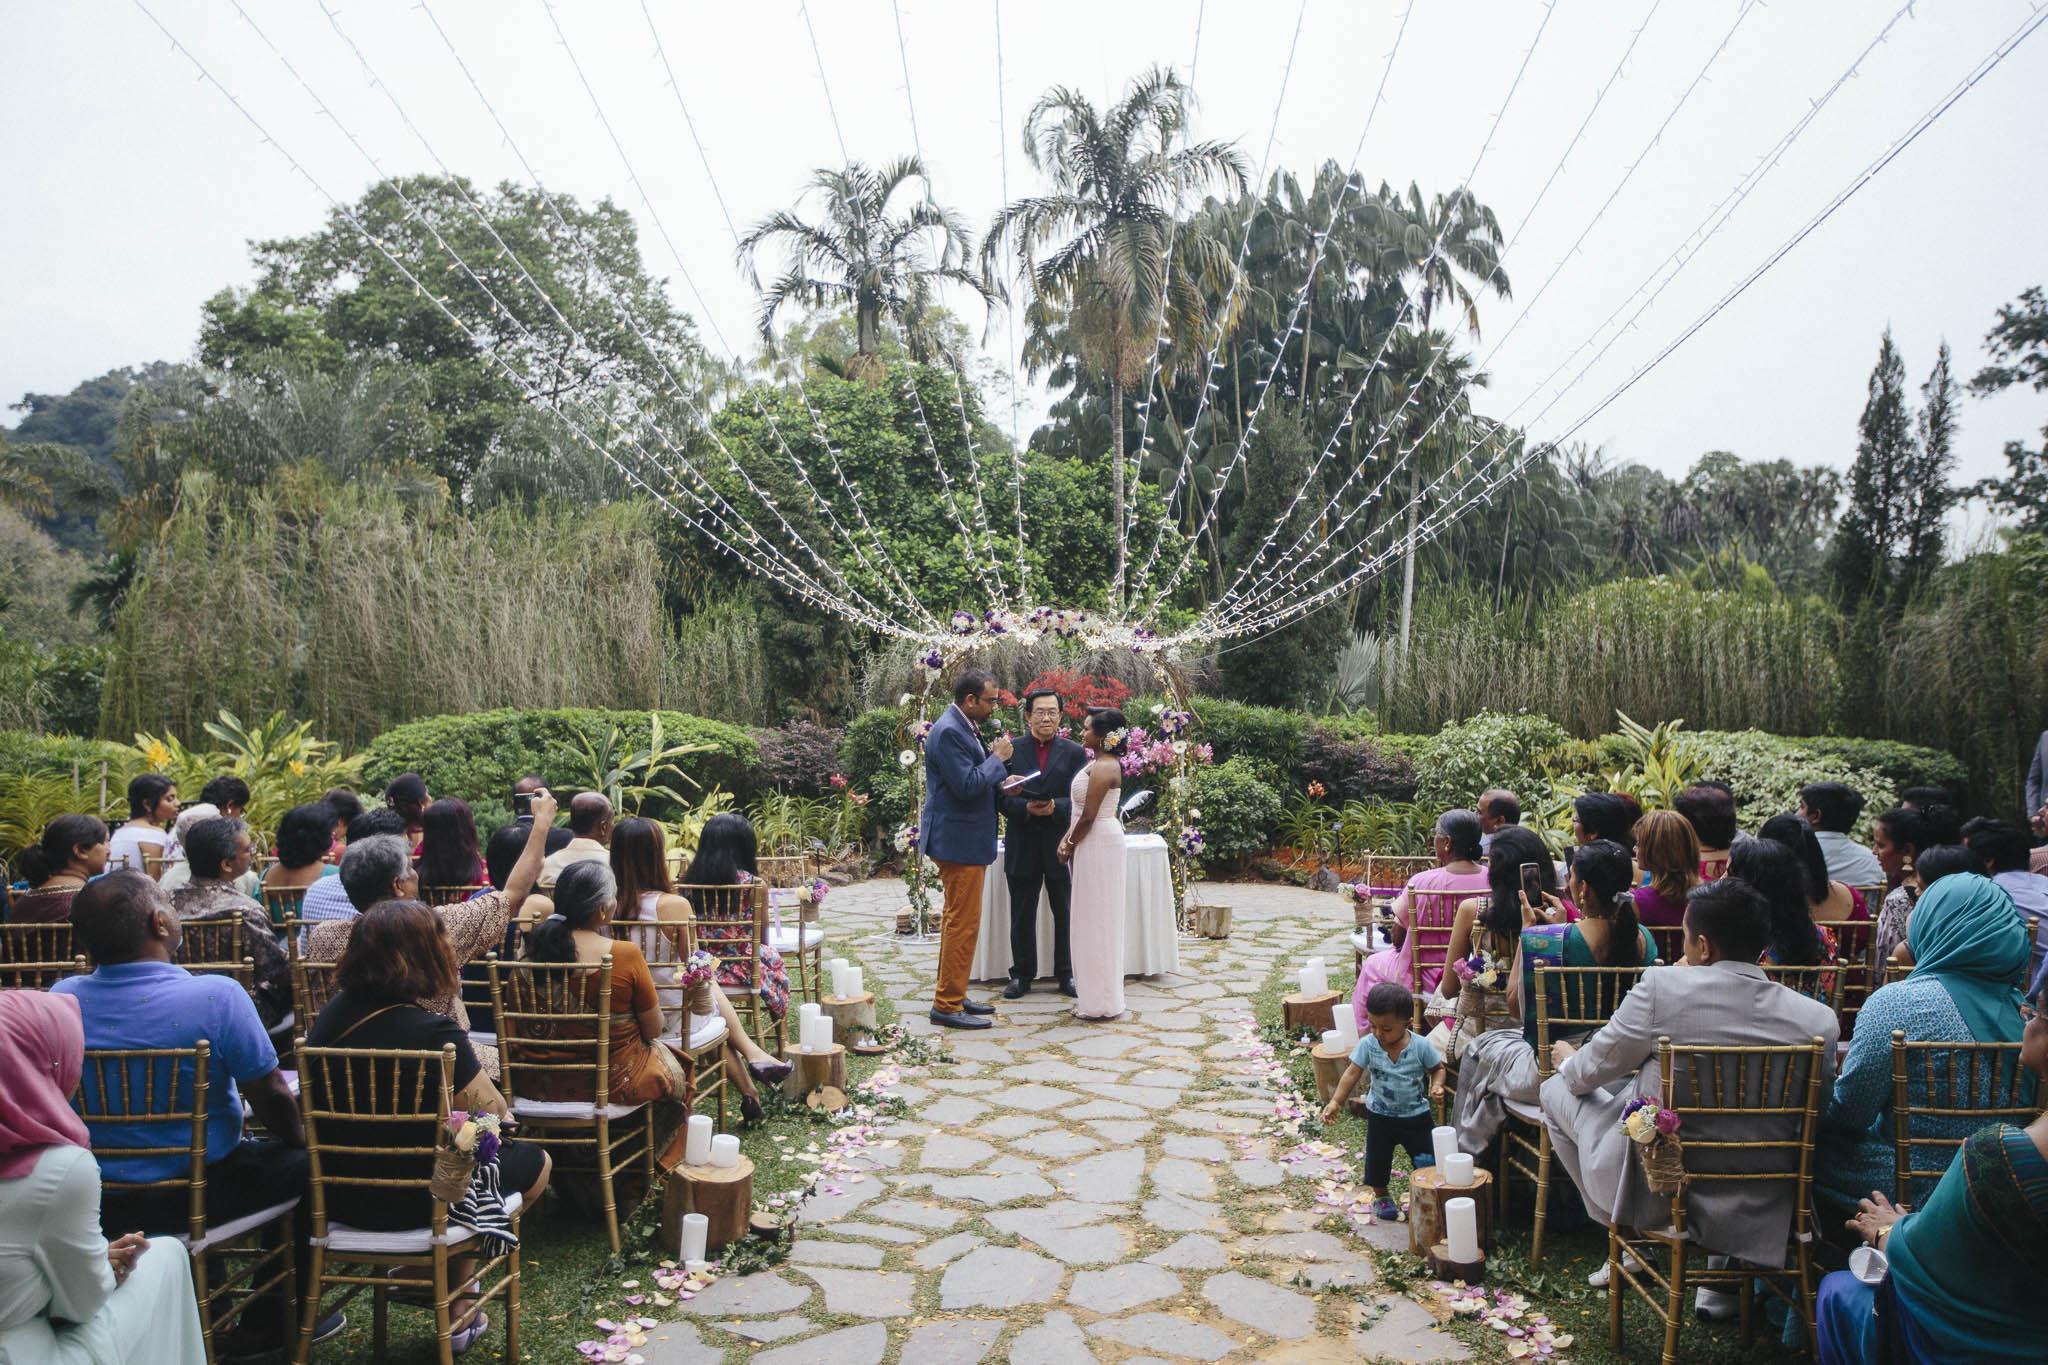 singapore-wedding-photographer-malay-indian-pre-wedding-travel-wmt-2015-67.jpg